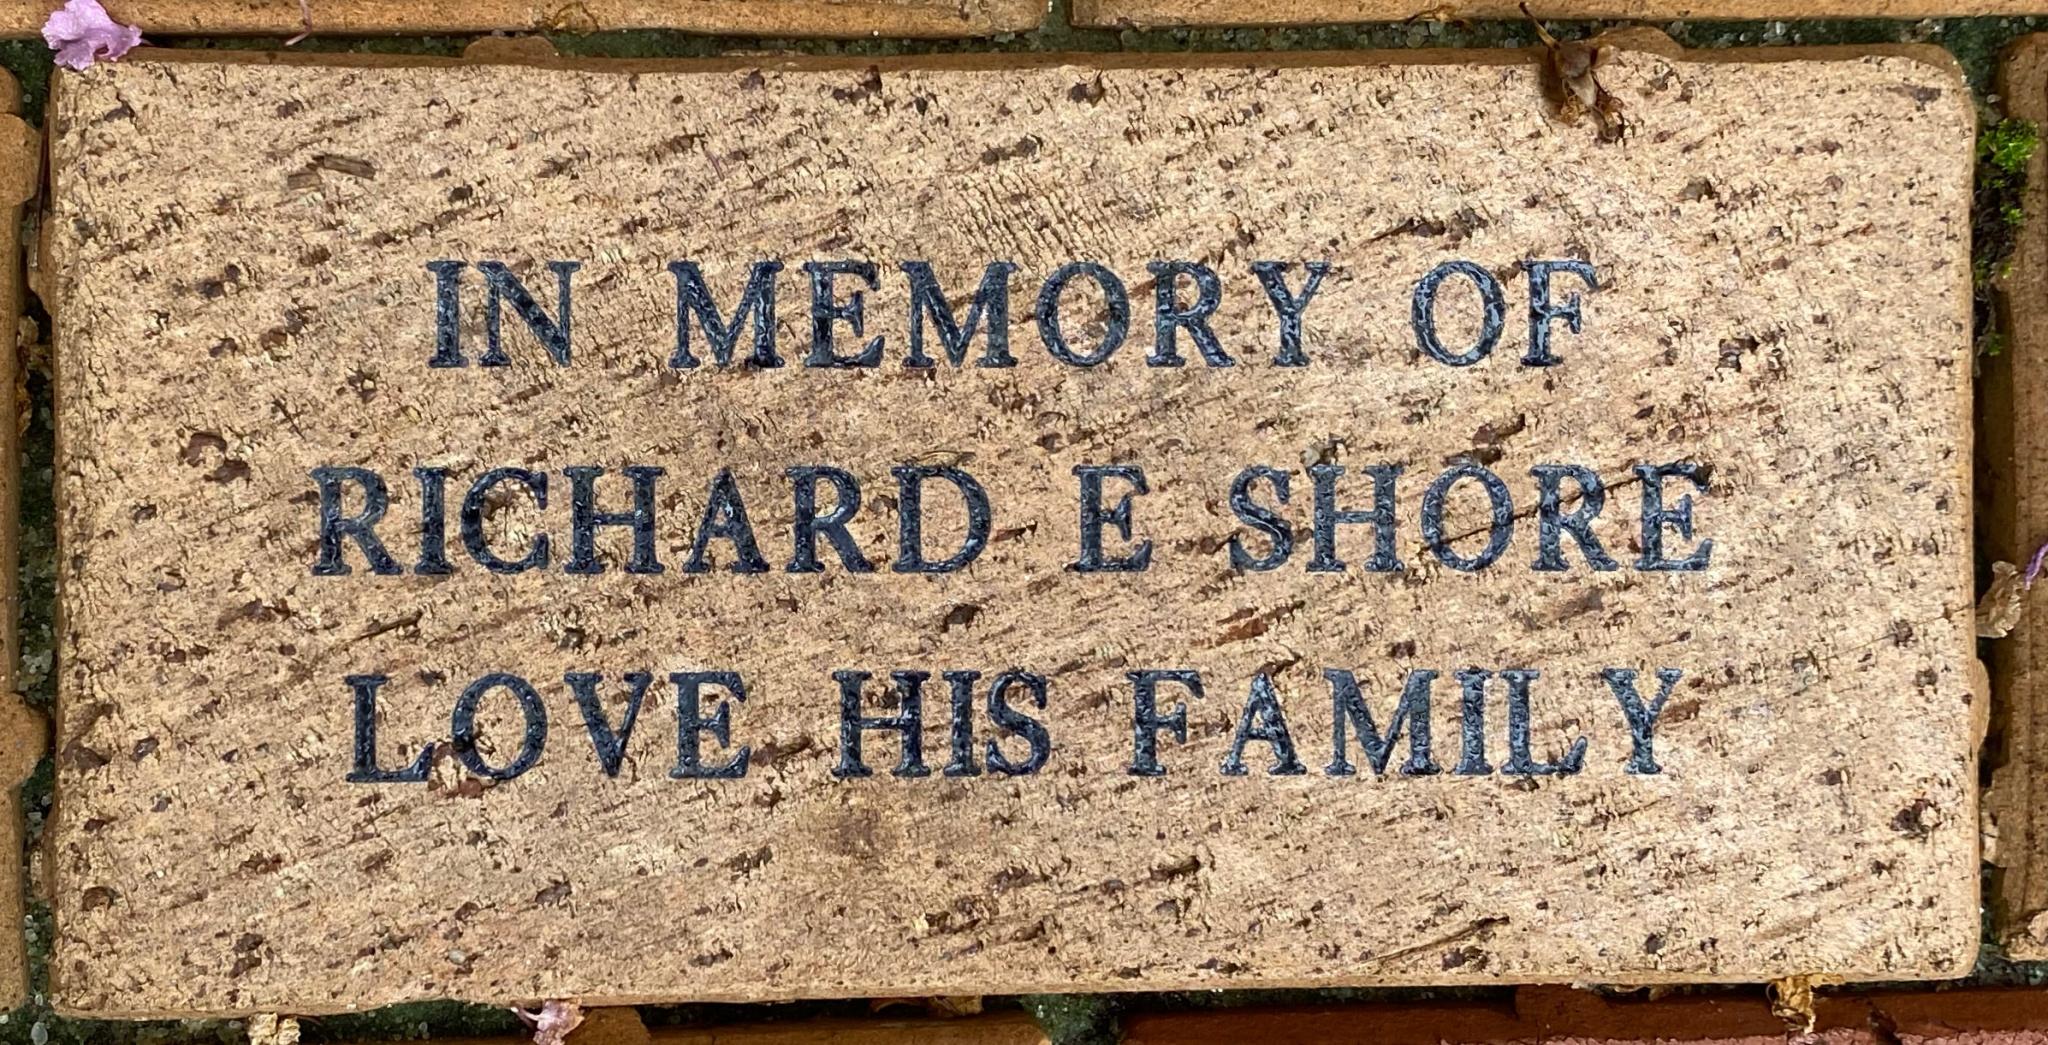 IN MEMORY OF  RICHARD E SHORE LOVE HIS FAMILY